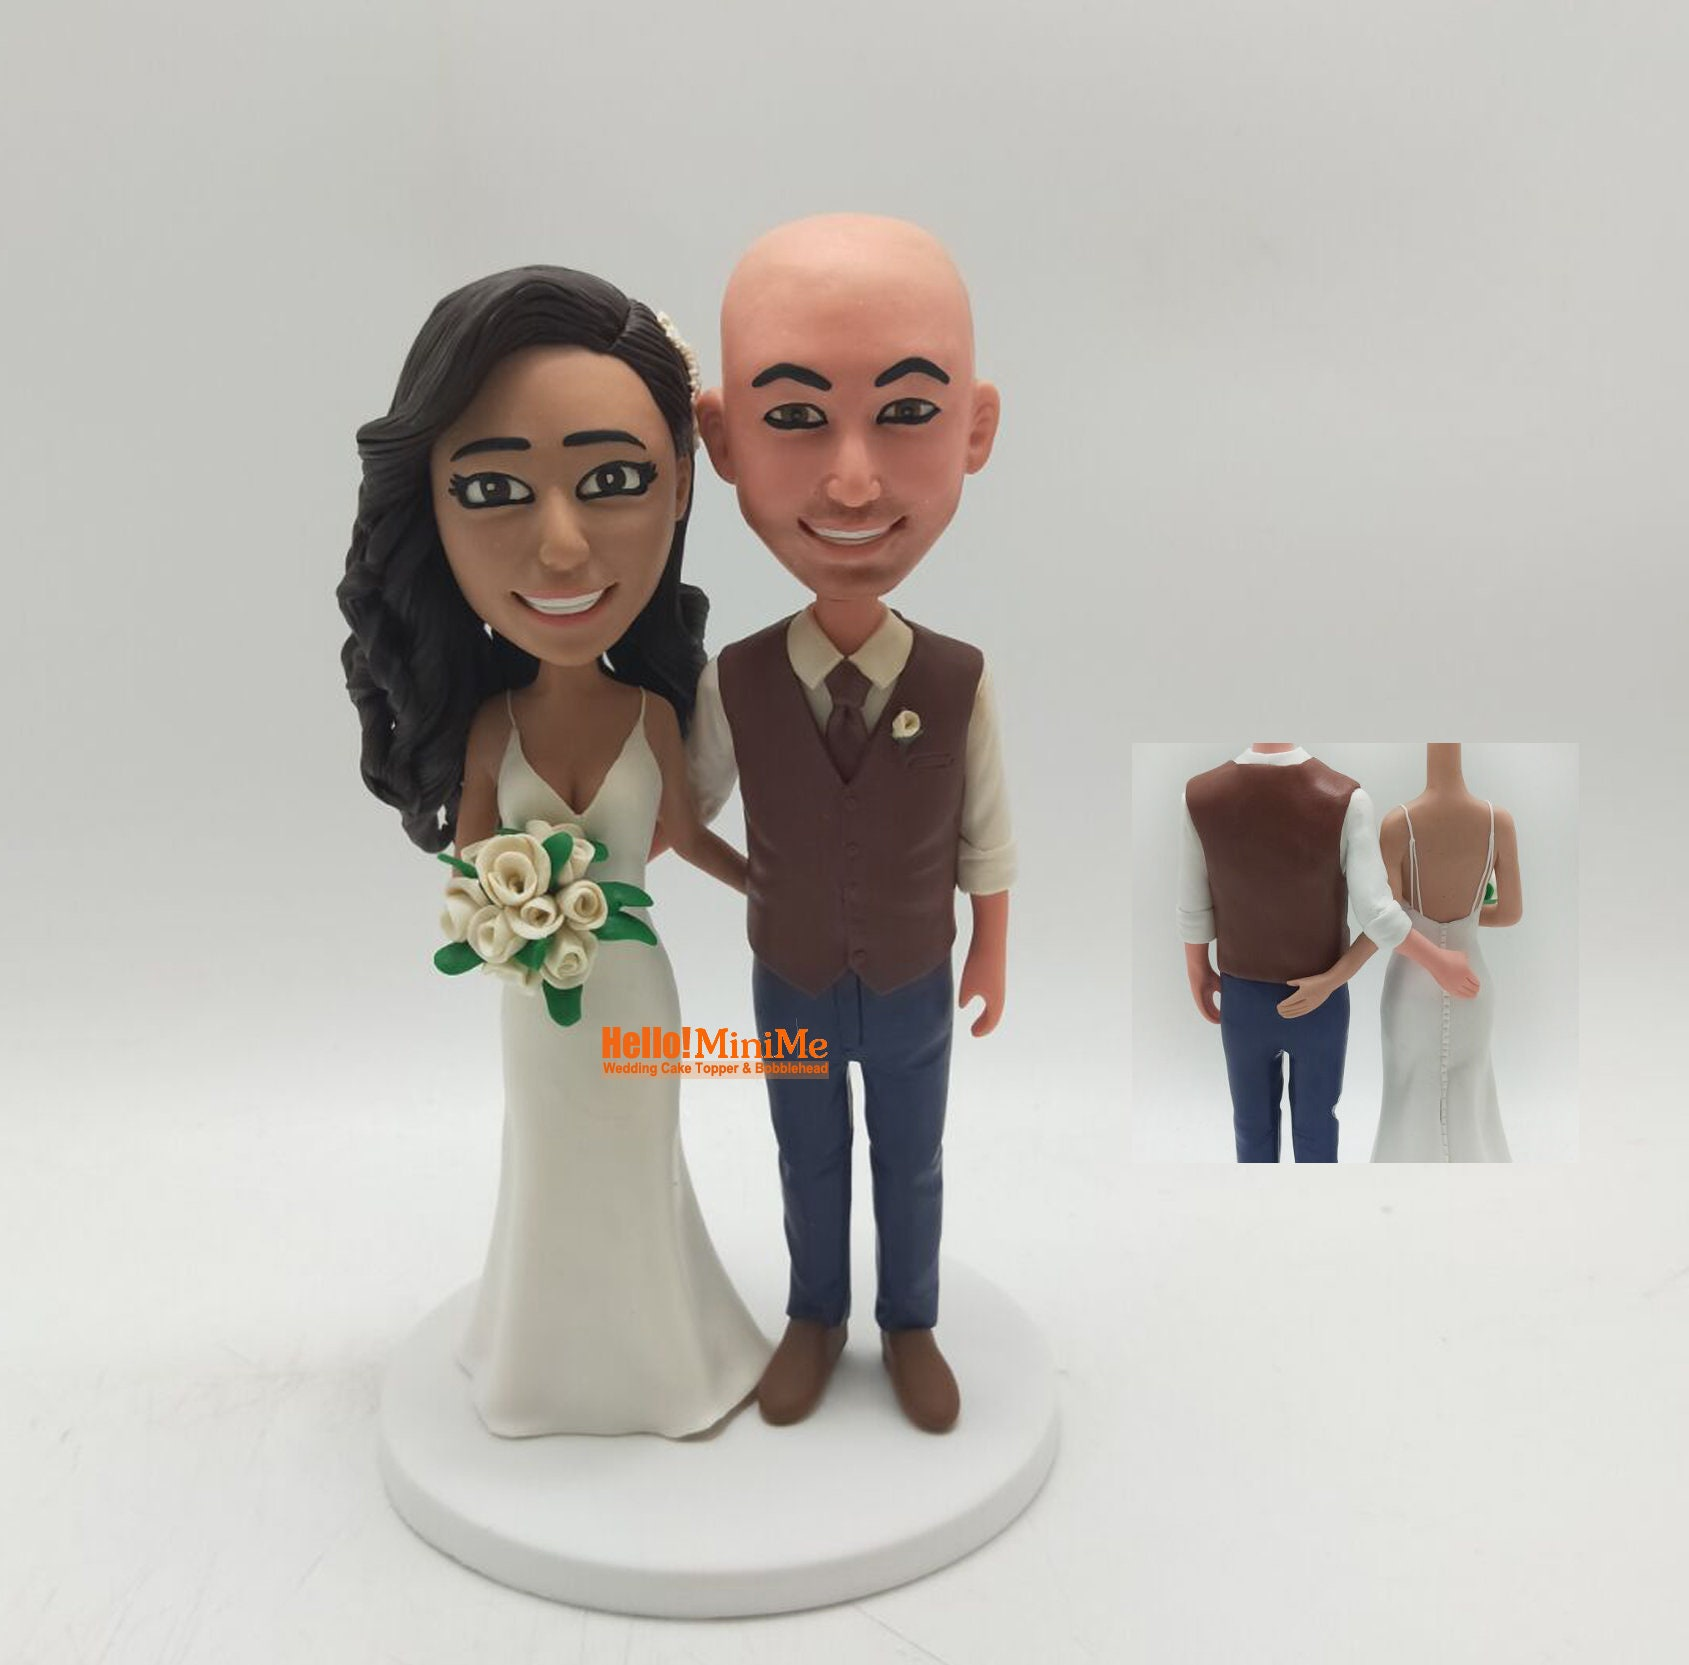 Mickey mouse hat Wedding cake topper custom Cake topper wedding bobblehead Custom cake toppers personalized wedding gift CT K427